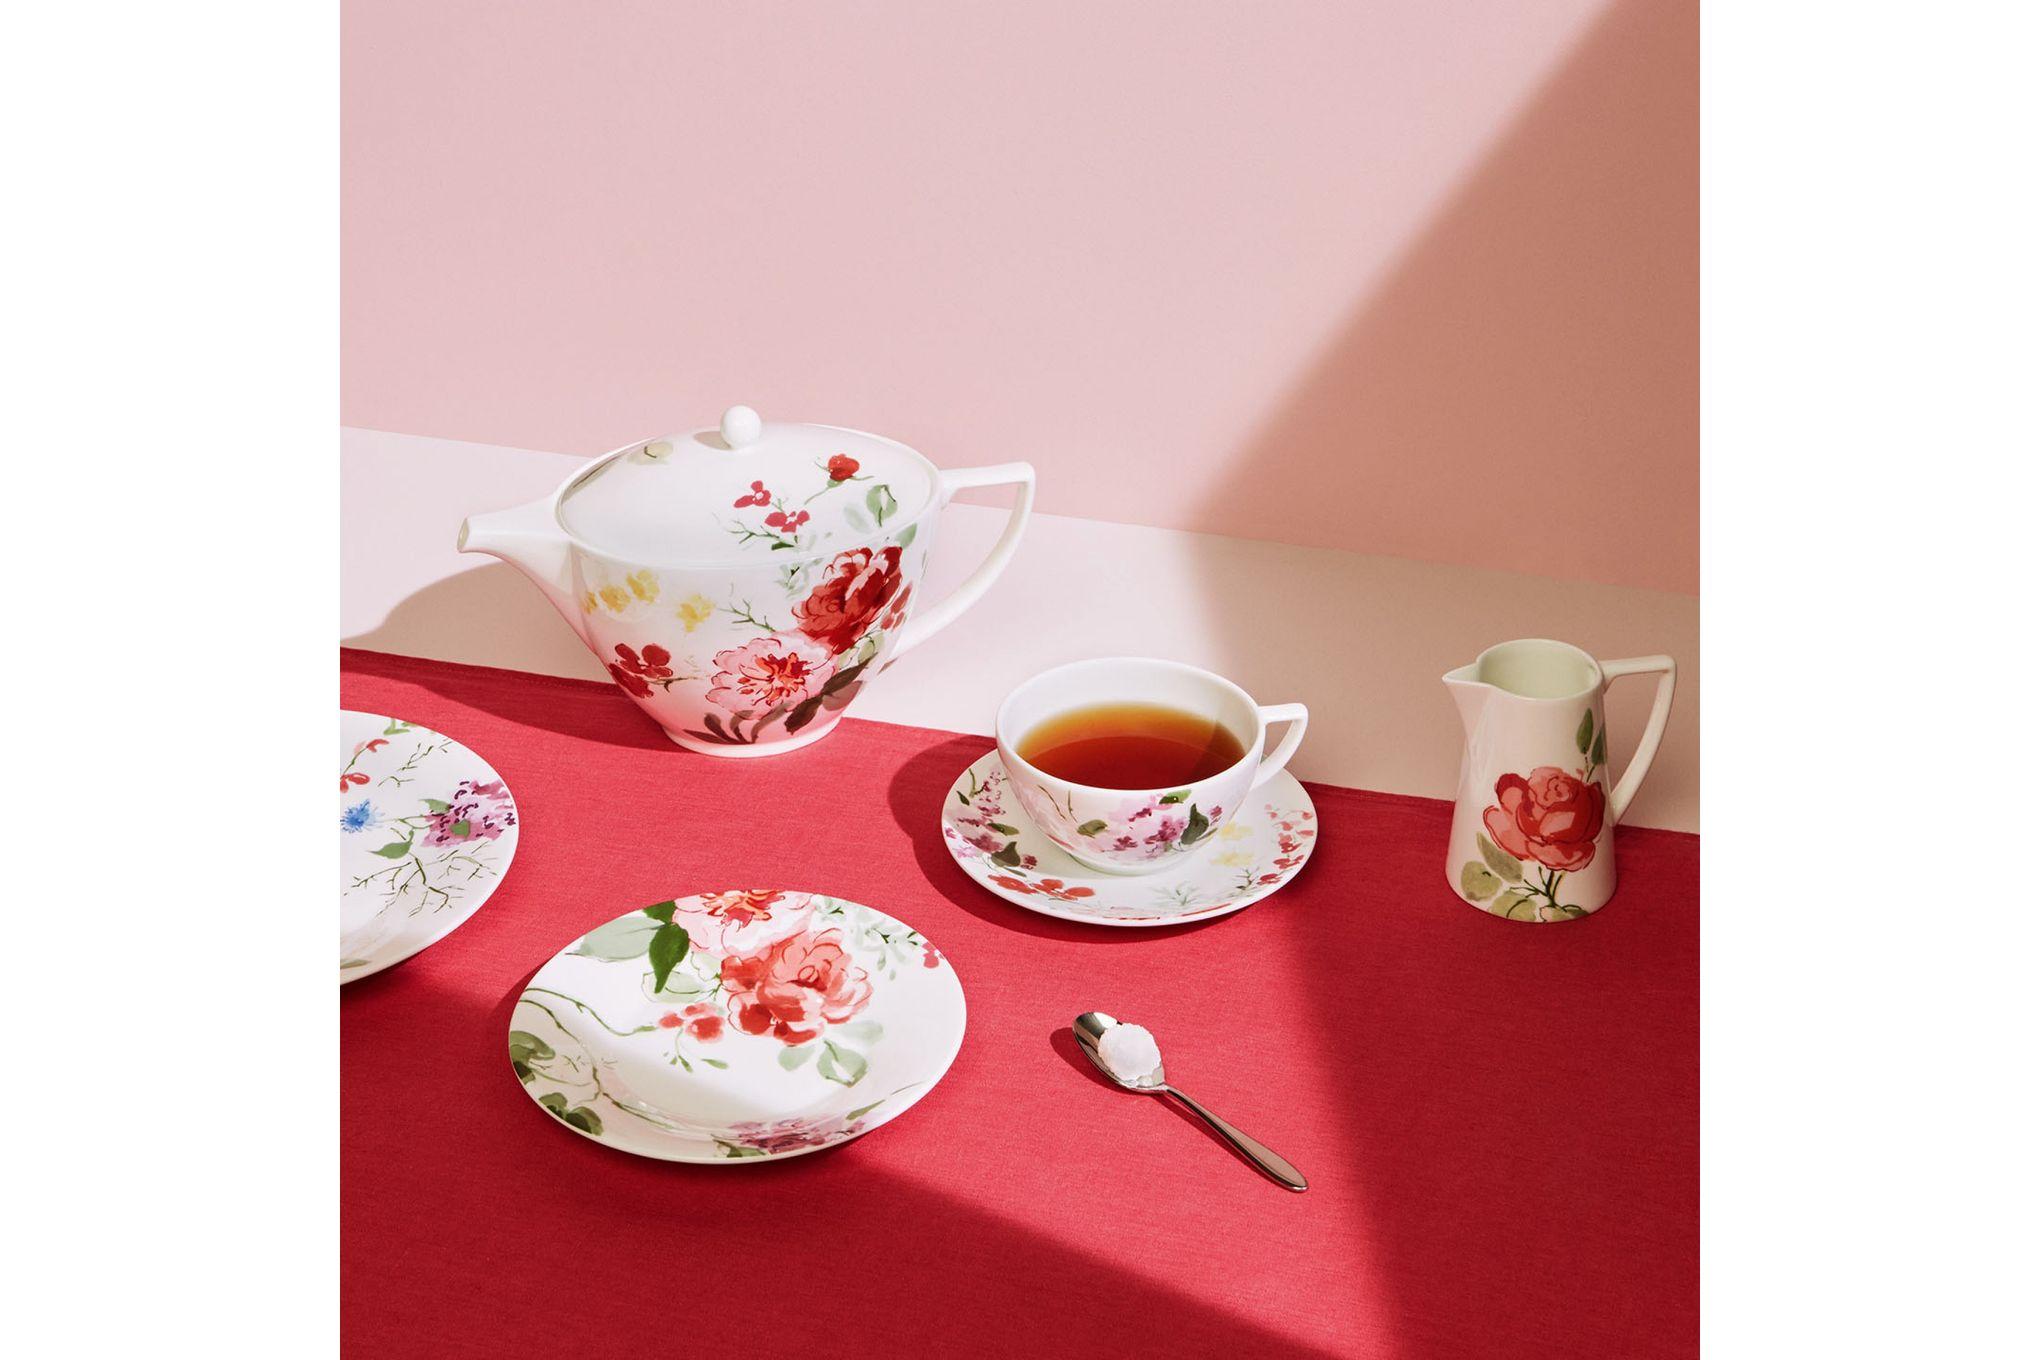 Jasper Conran for Wedgwood Floral Teapot 1.2l thumb 2